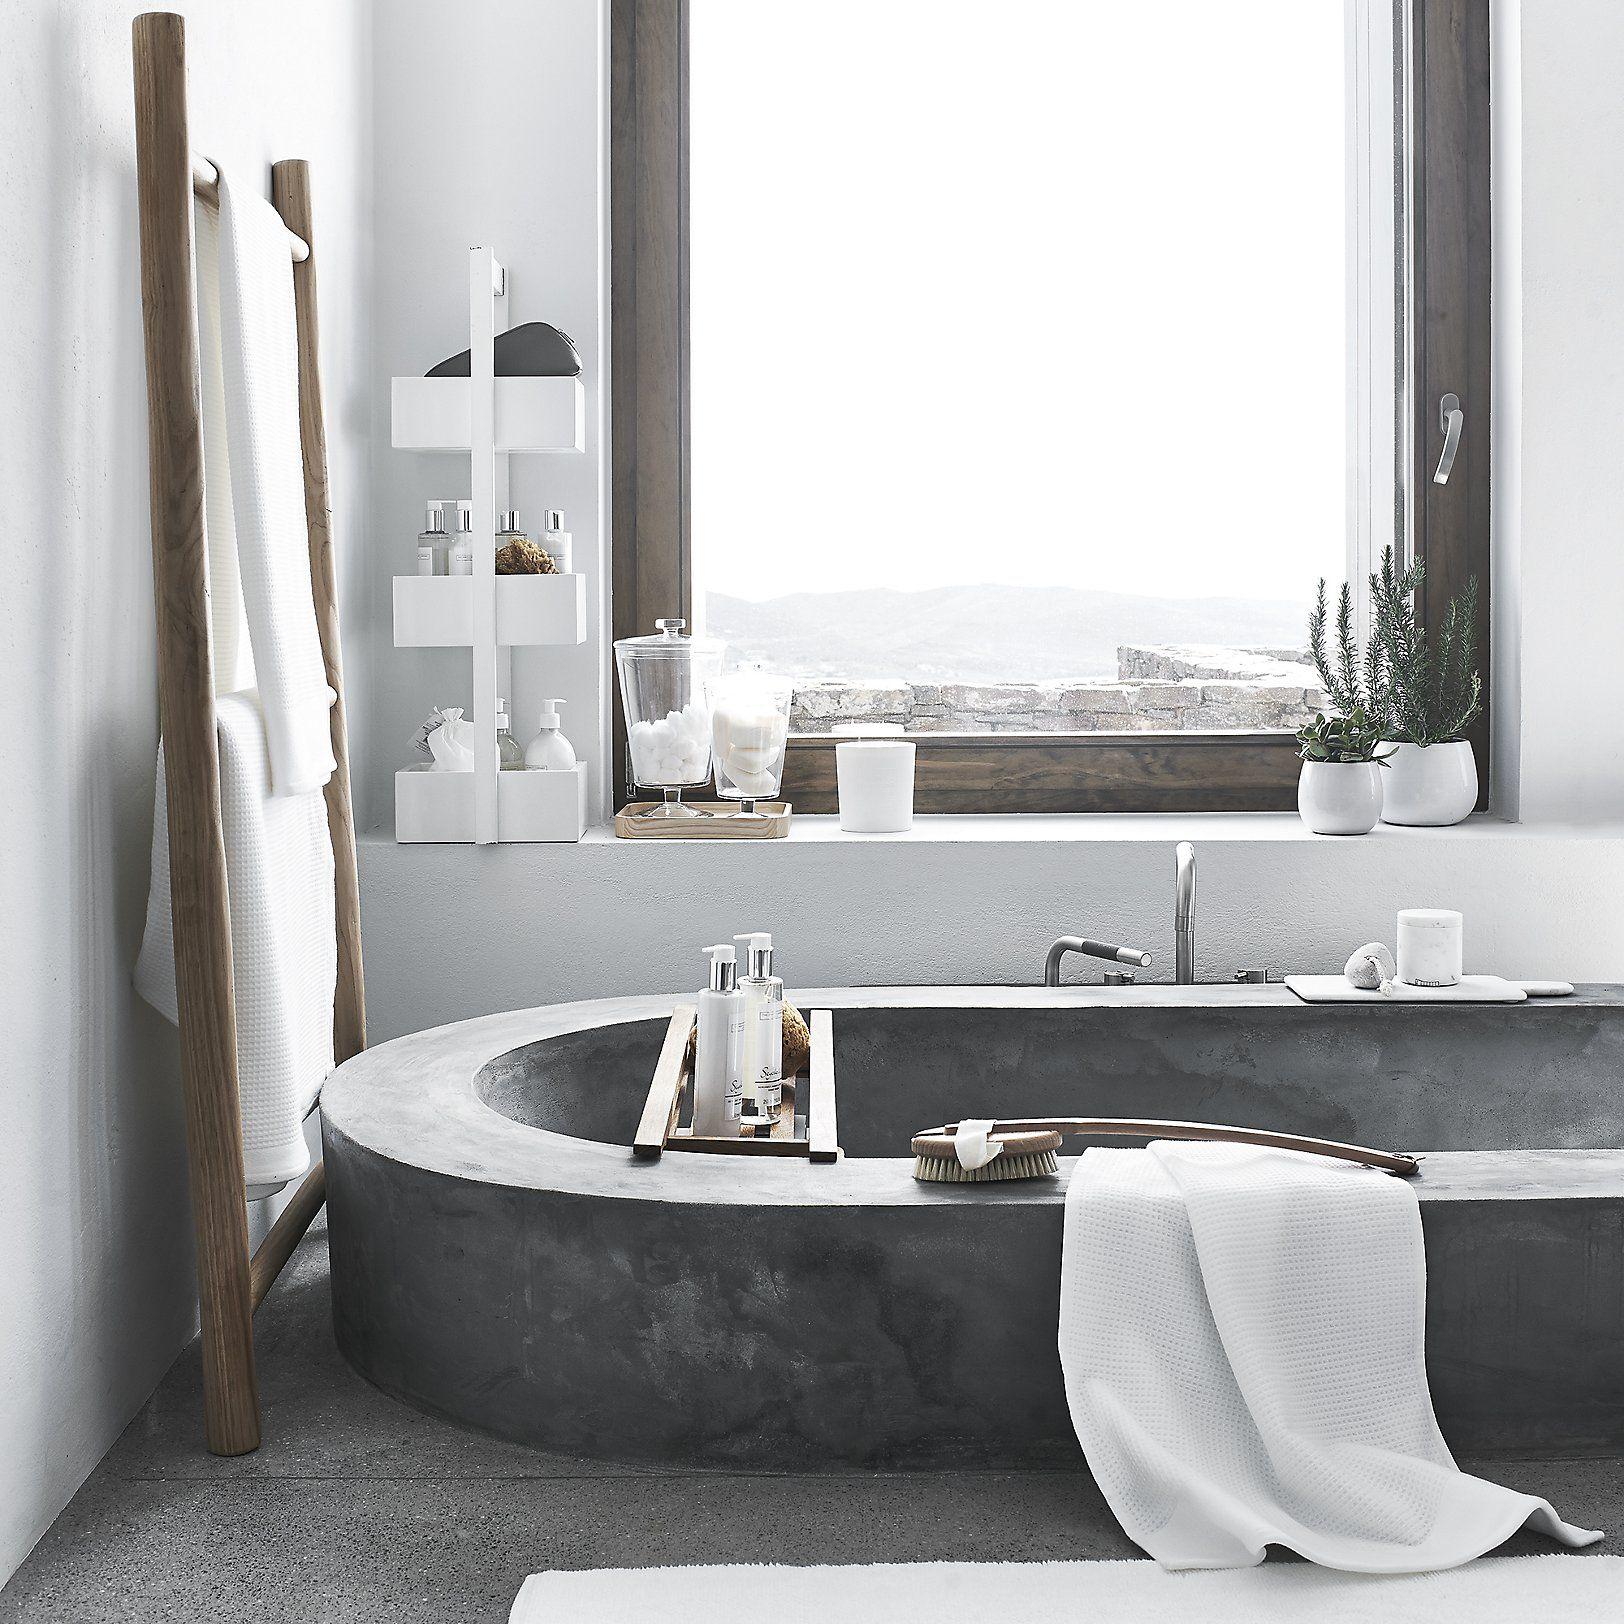 Marble Lidded Pot | Bathroom ⌂ | Pinterest | White company, Marbles ...